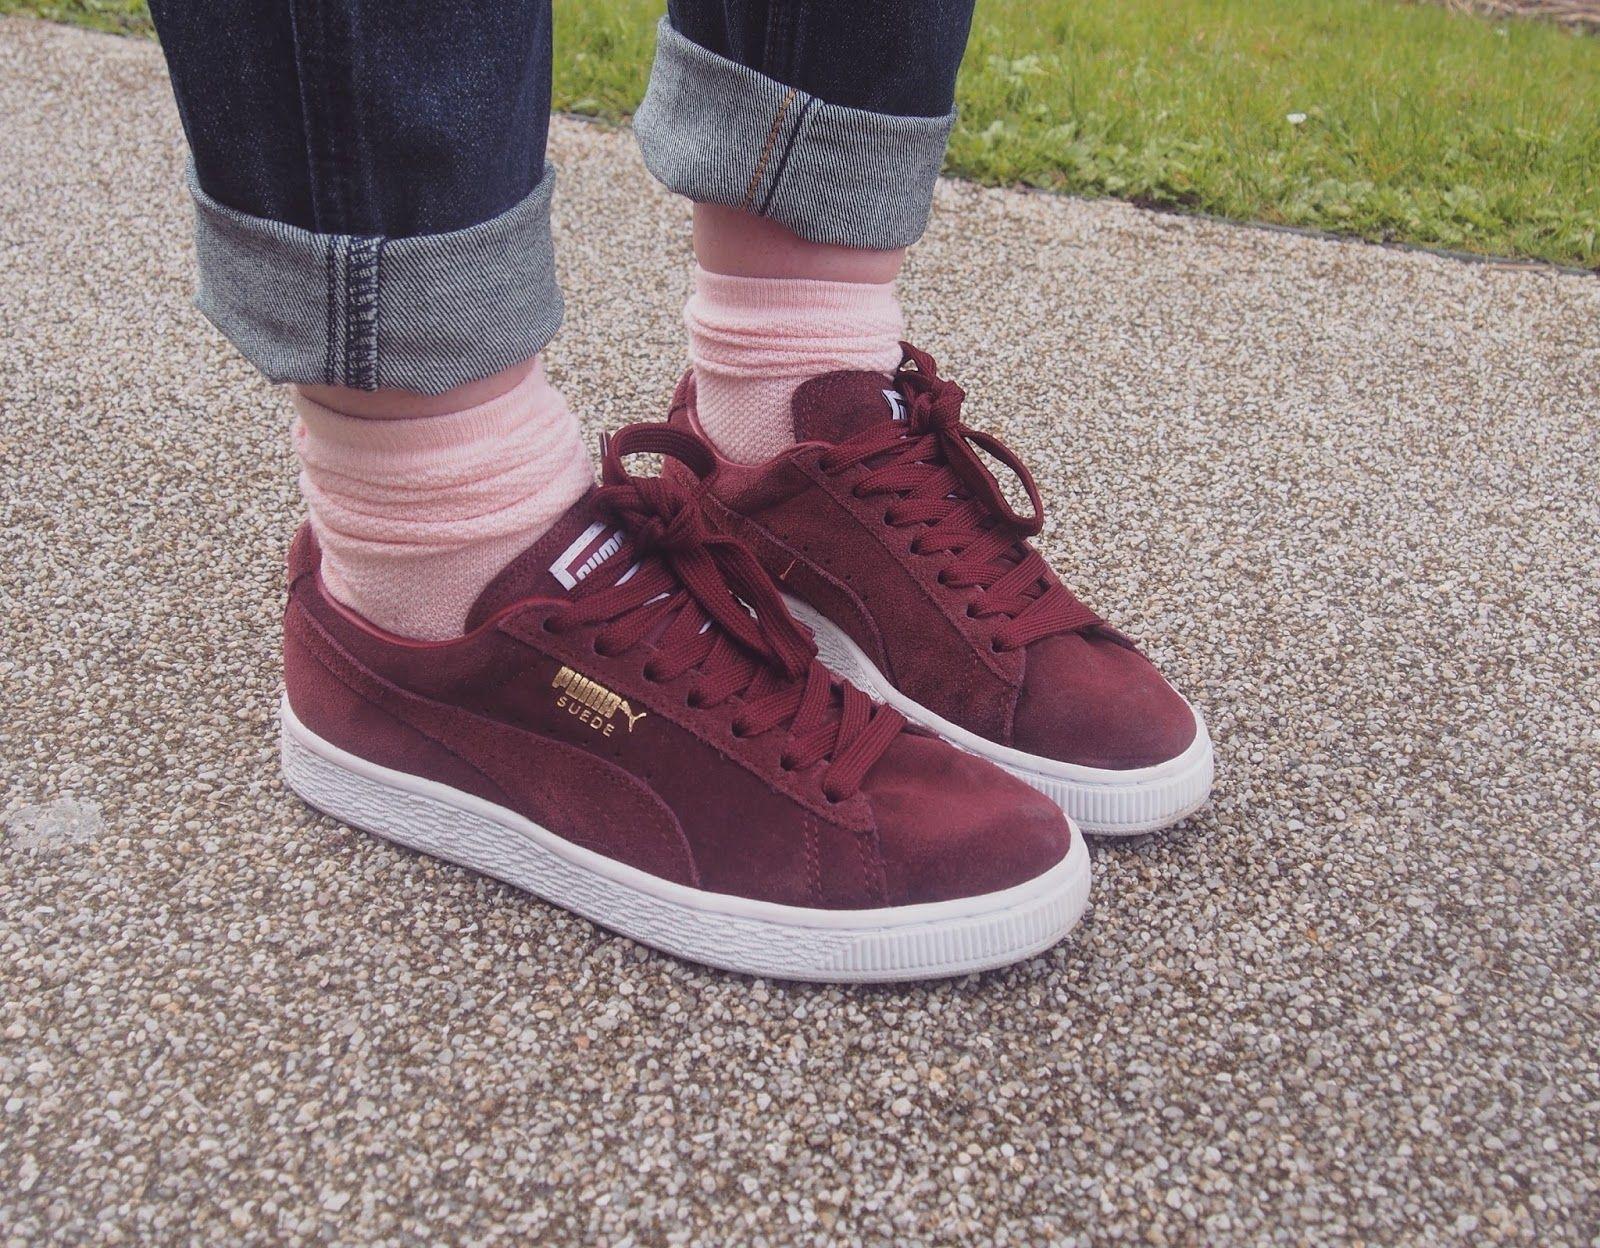 puma sneakers suede bordeaux